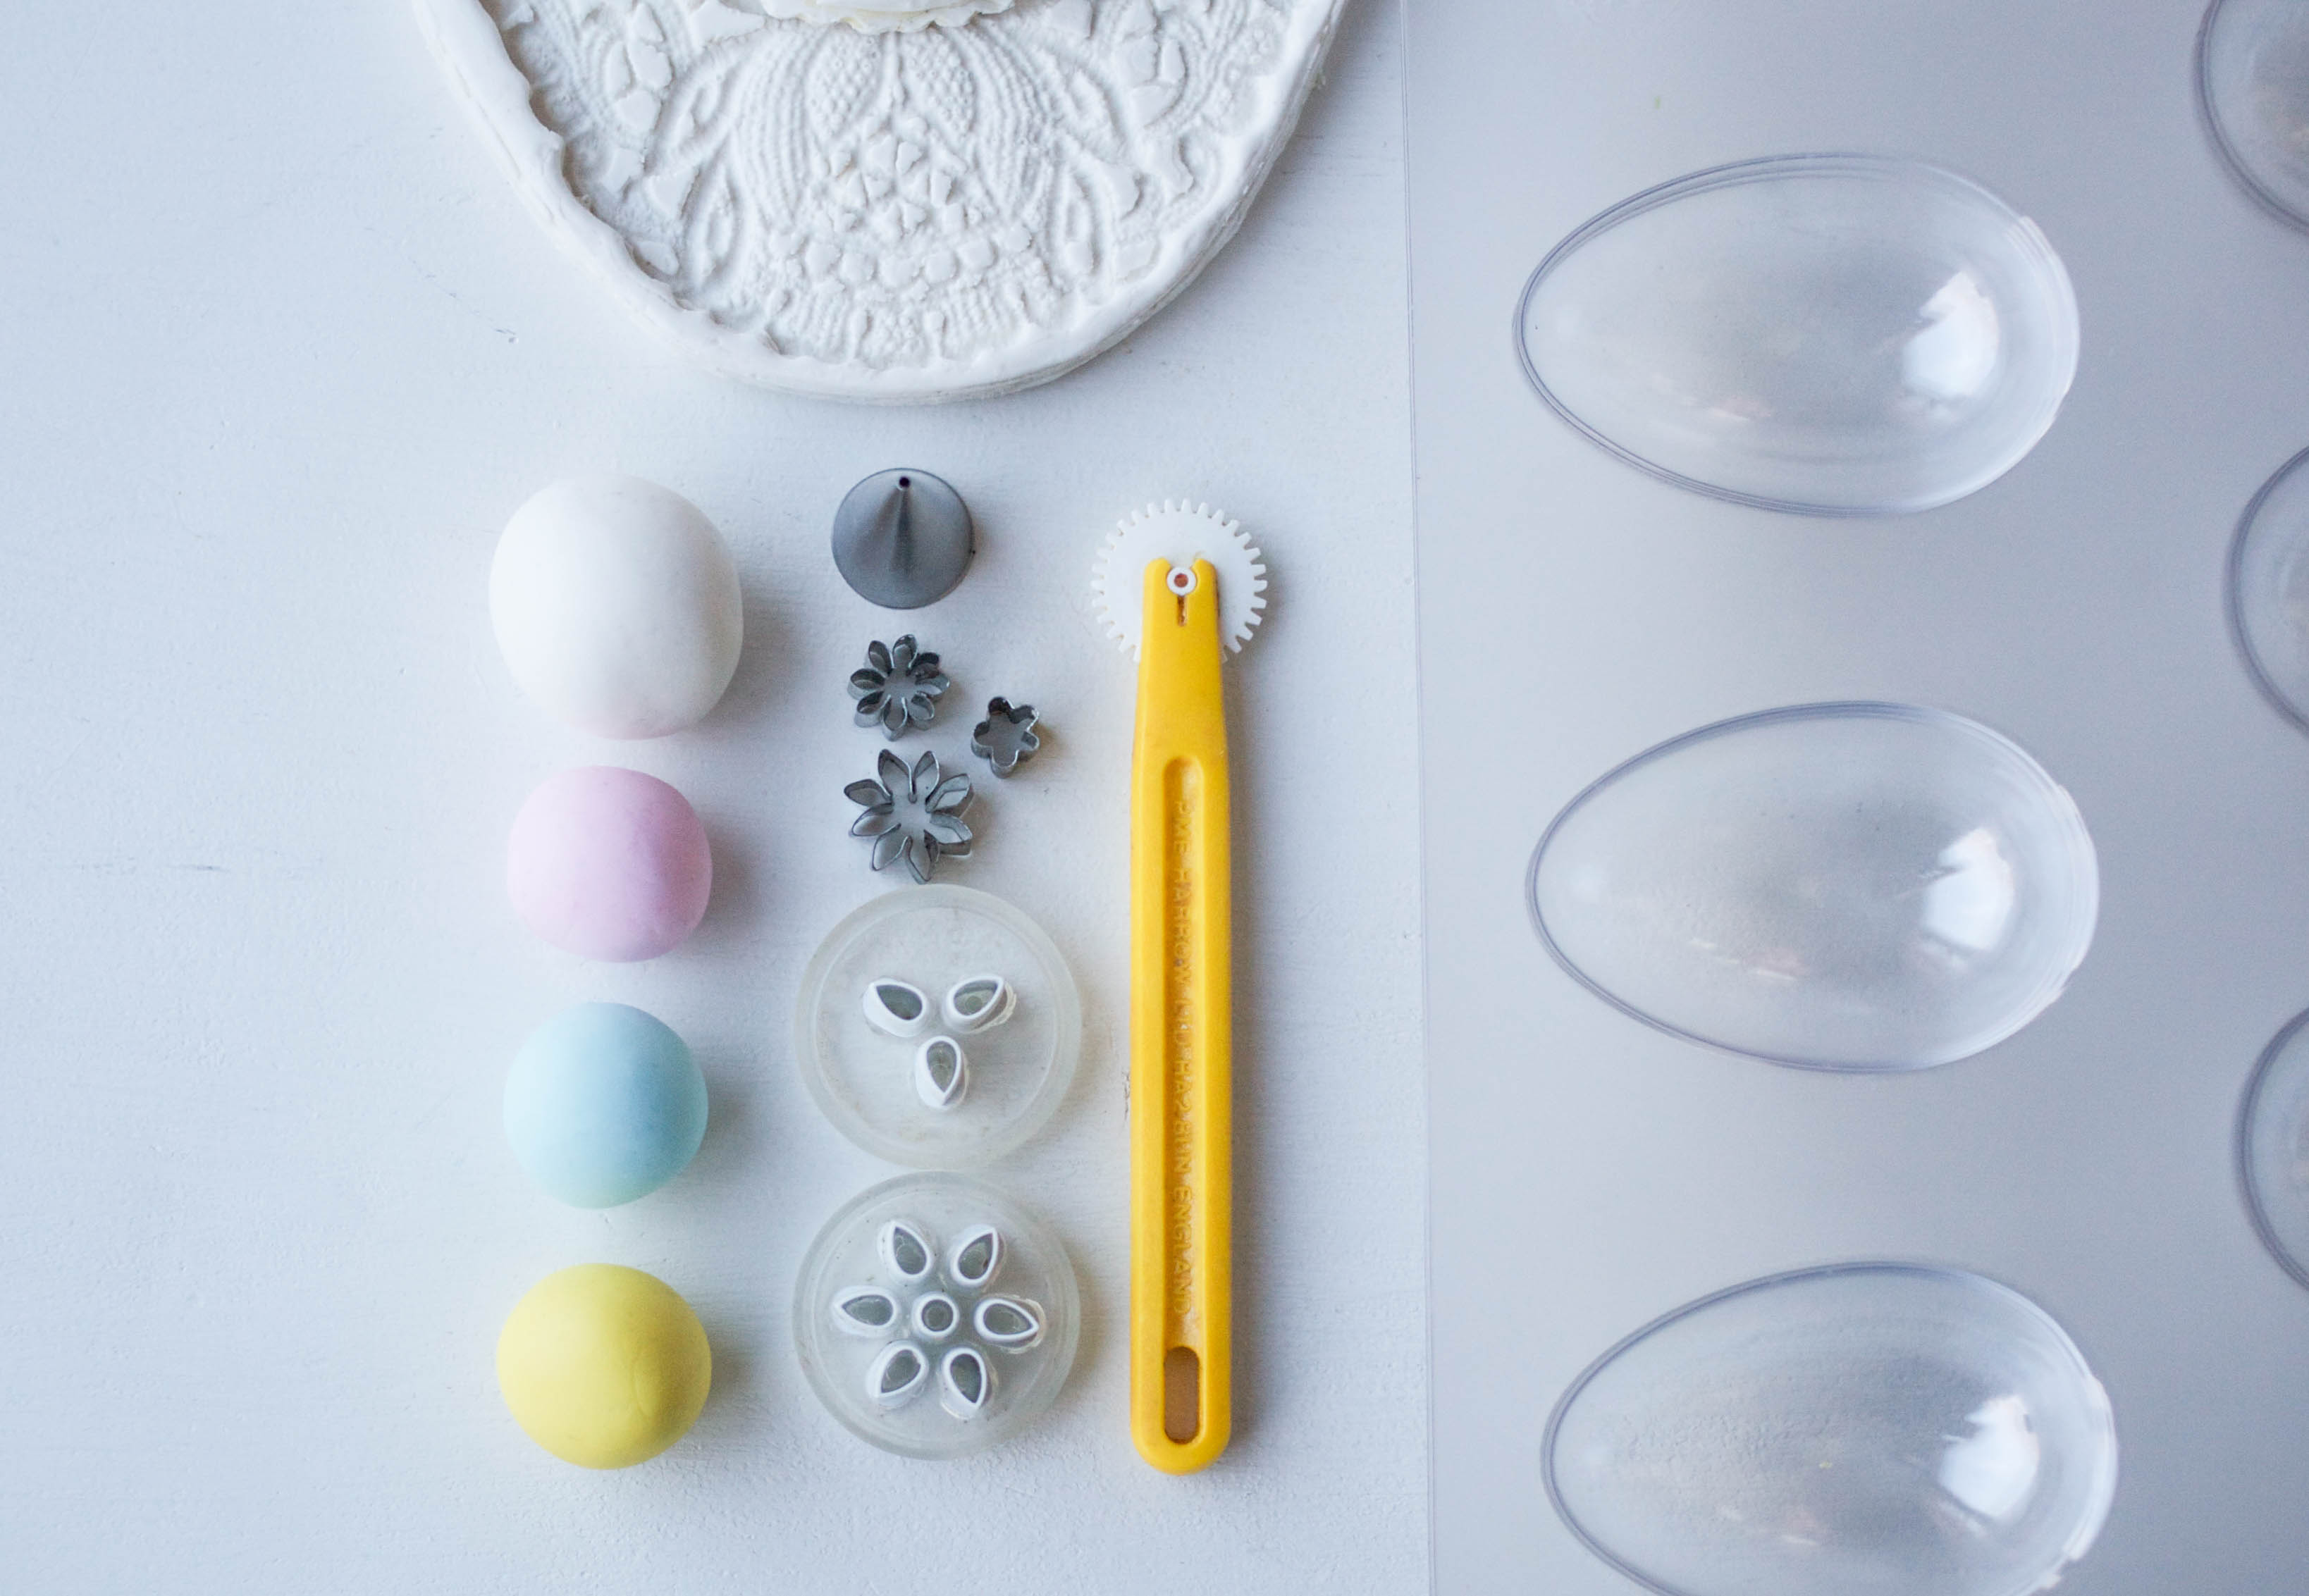 Eyelet & Lace Gum Paste Egg Supplies | Bluprint | Erin Gardner